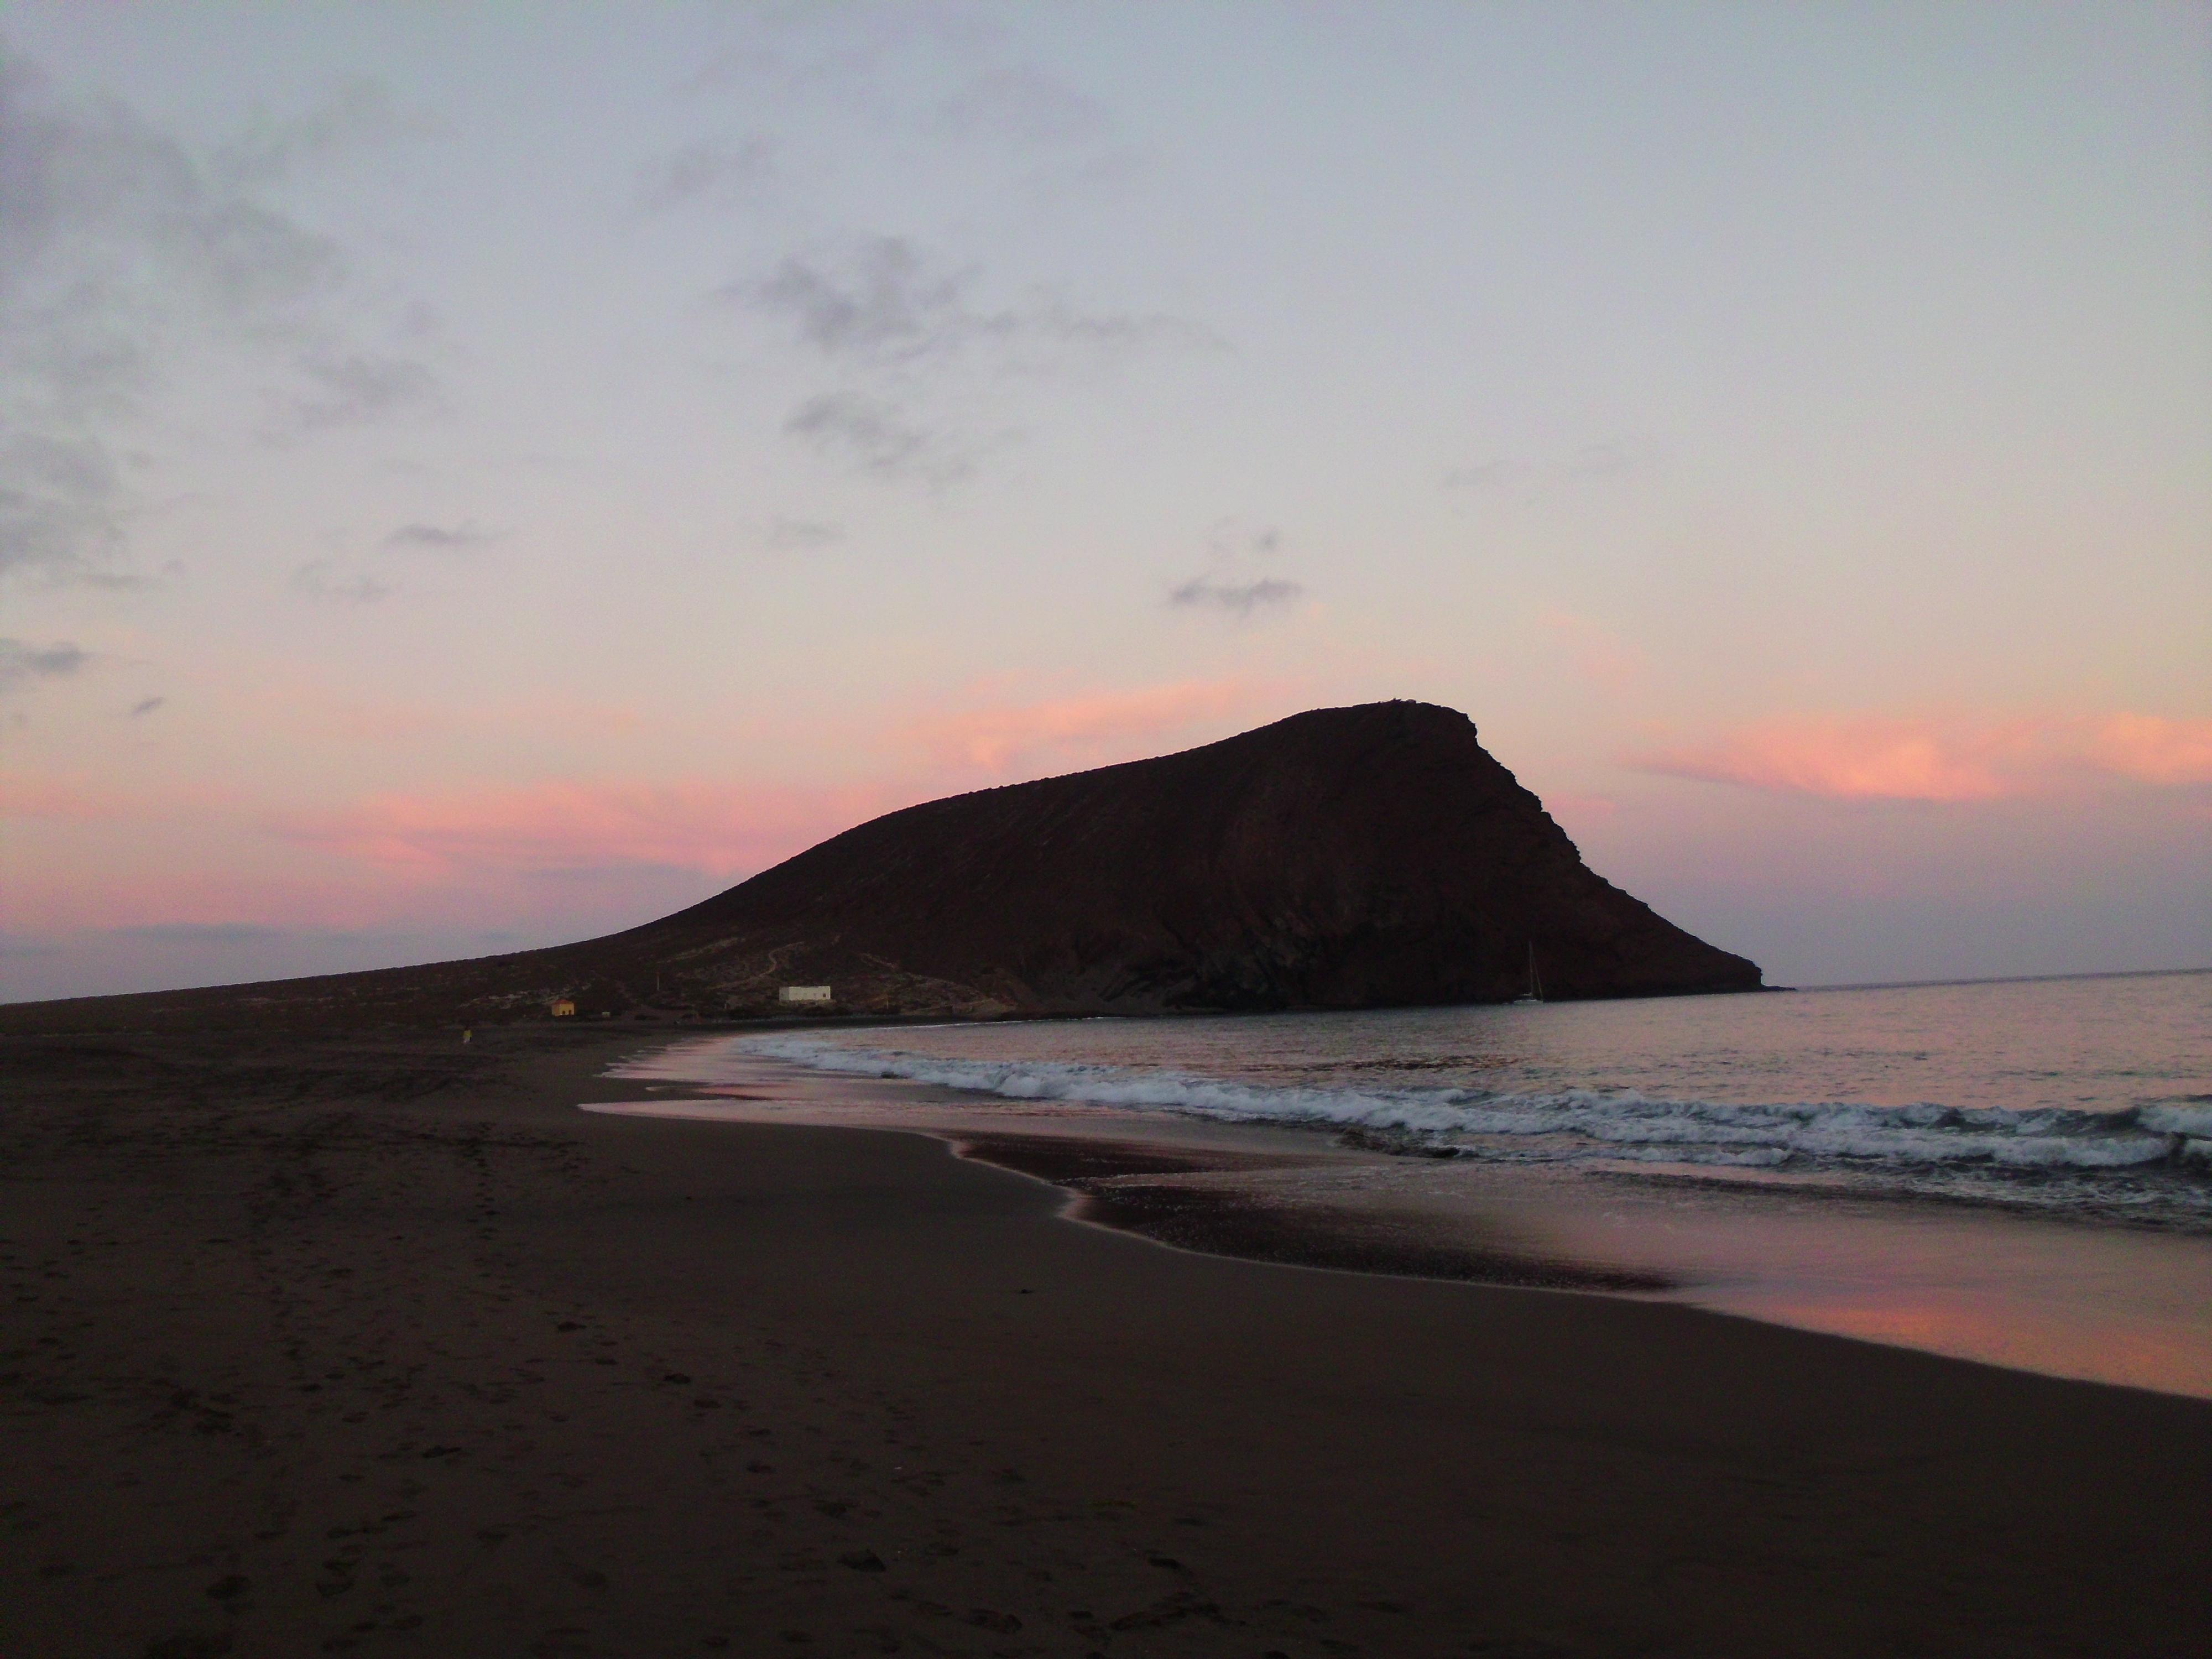 Sunset at Playa de La Tejita #2